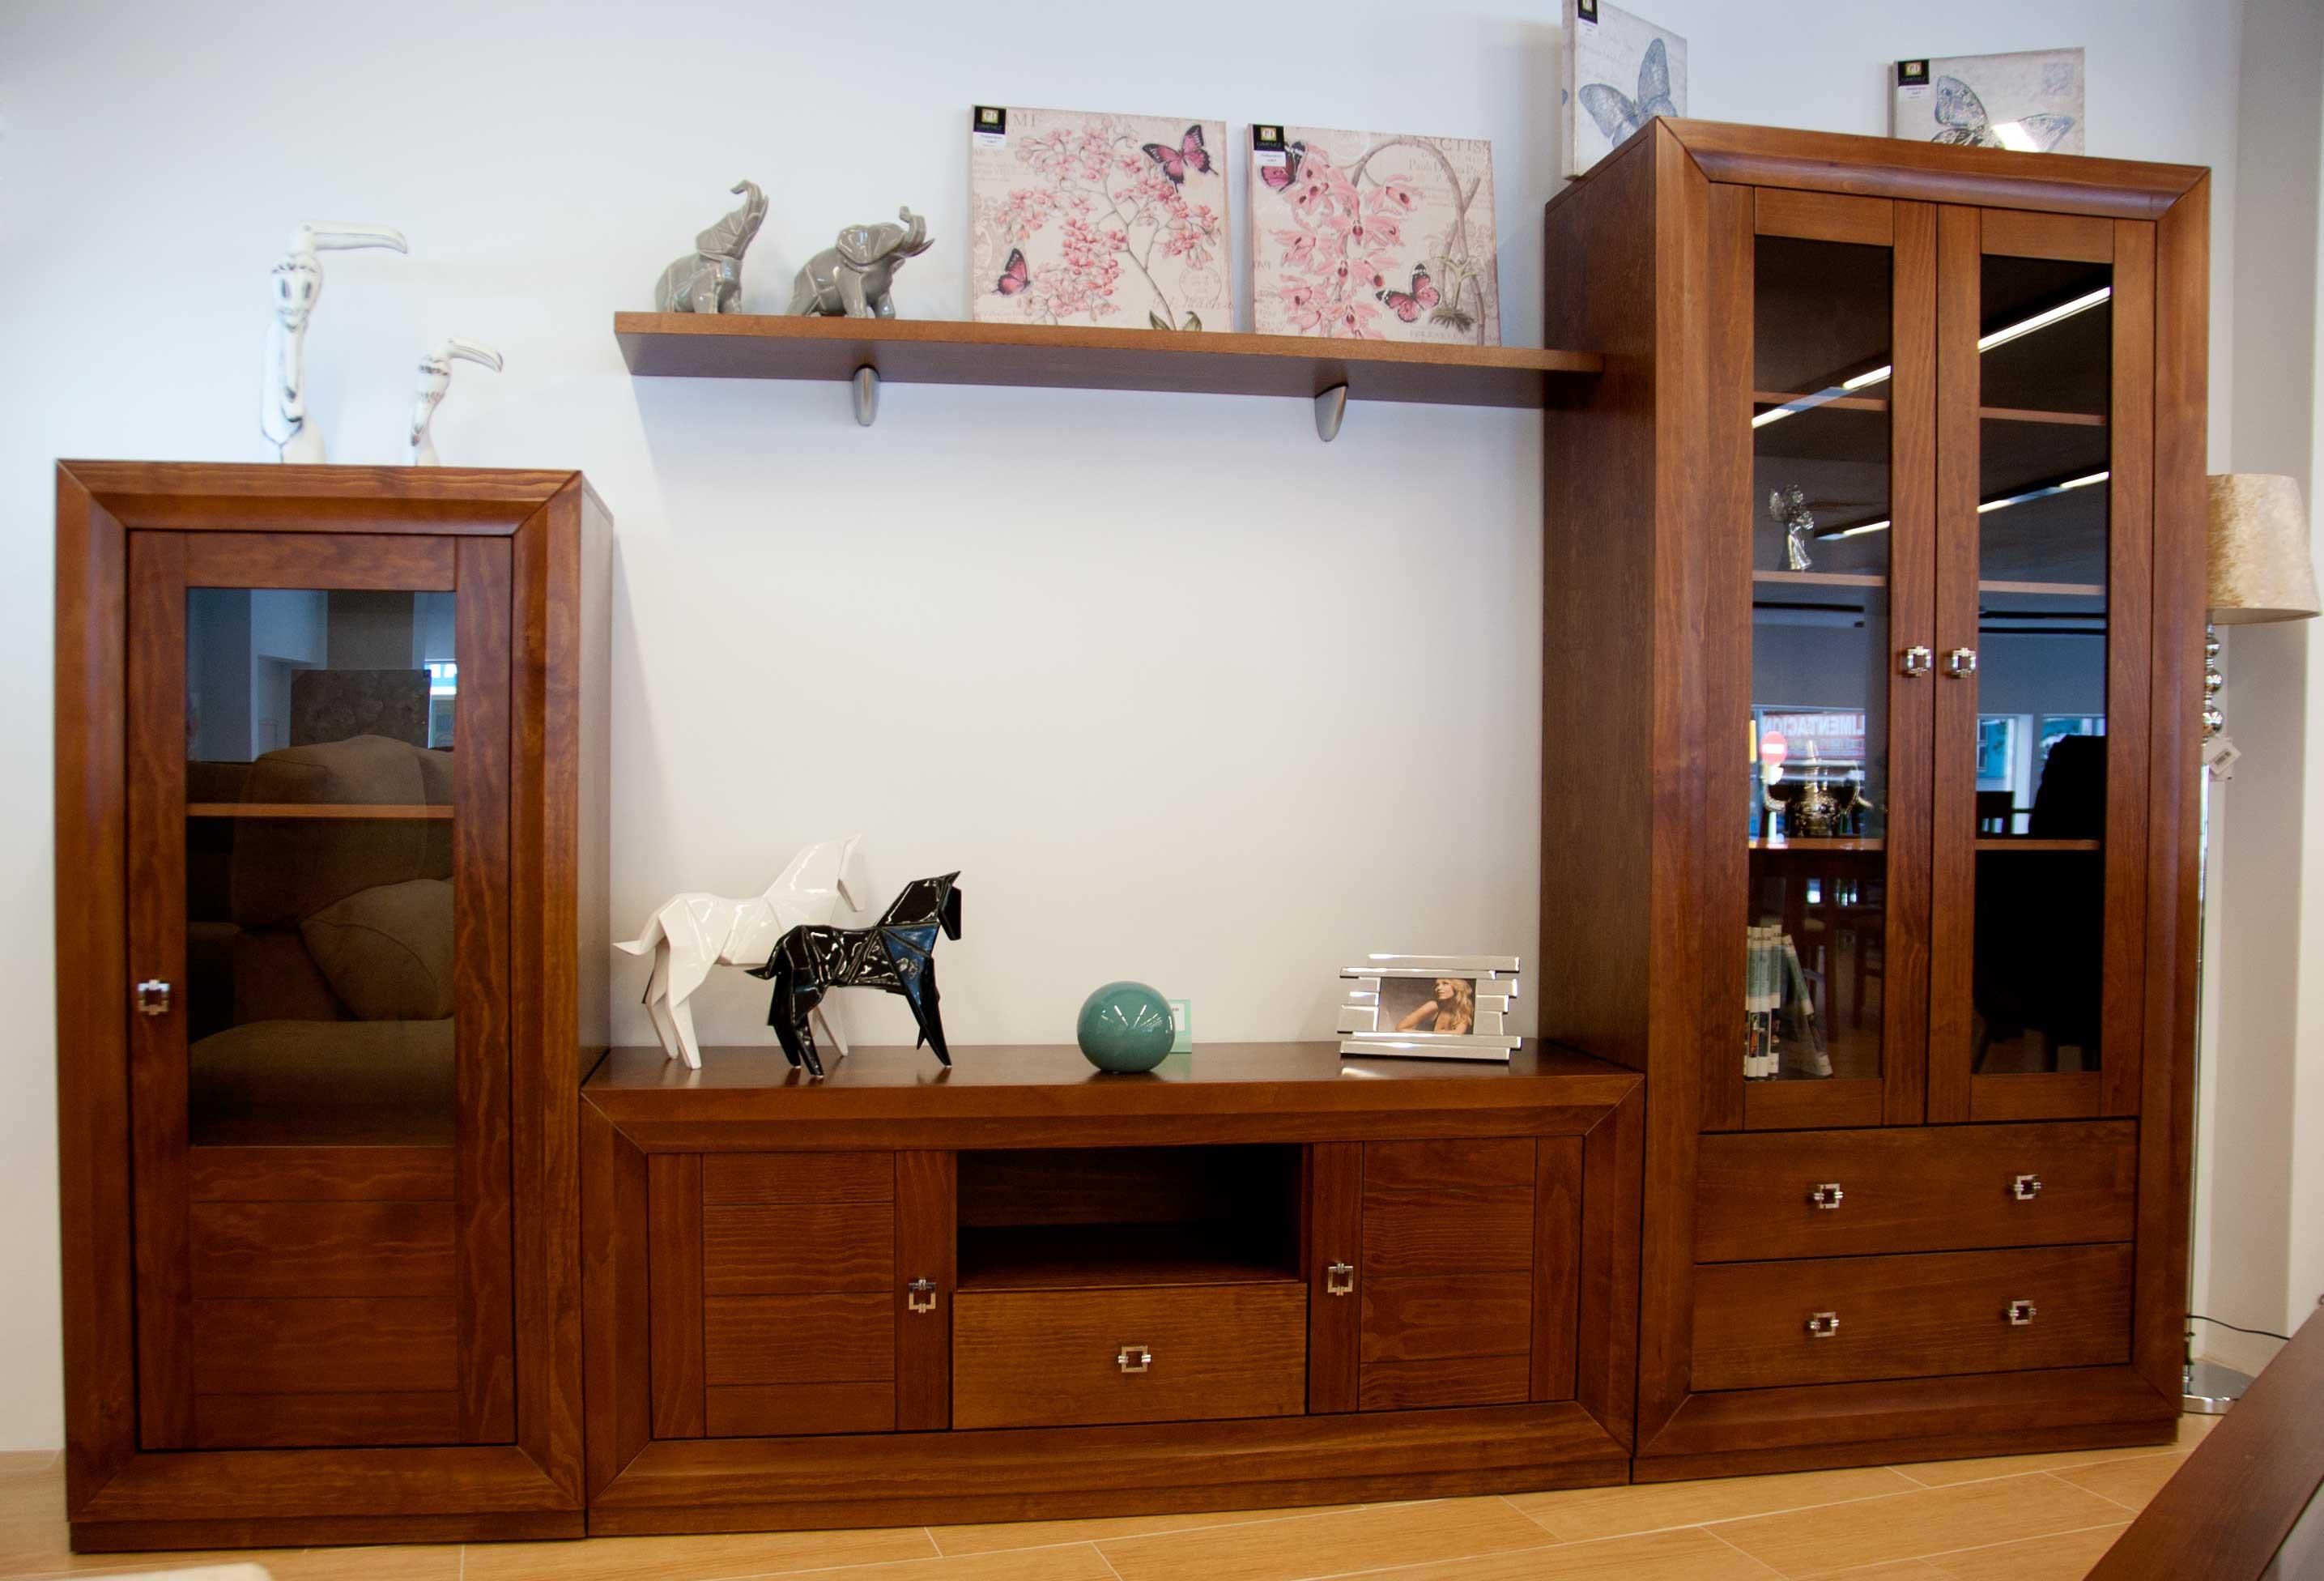 Muebles comedor madera muebles de madera centenaria for Muebles comedor madera